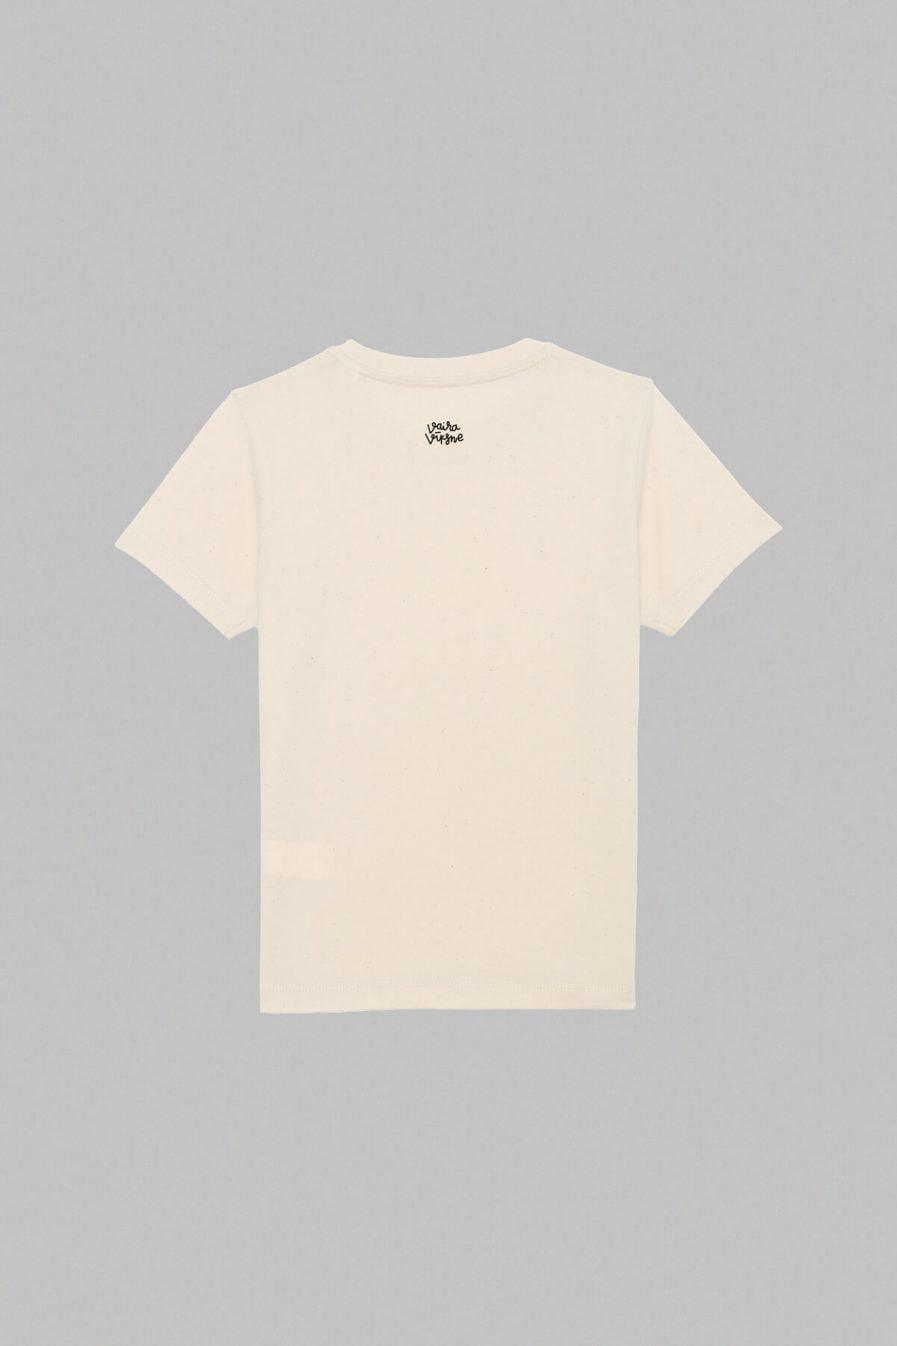 Vaira Vīksne KIDS Organic Cotton T-shirt Condensed Milk - Vintage white